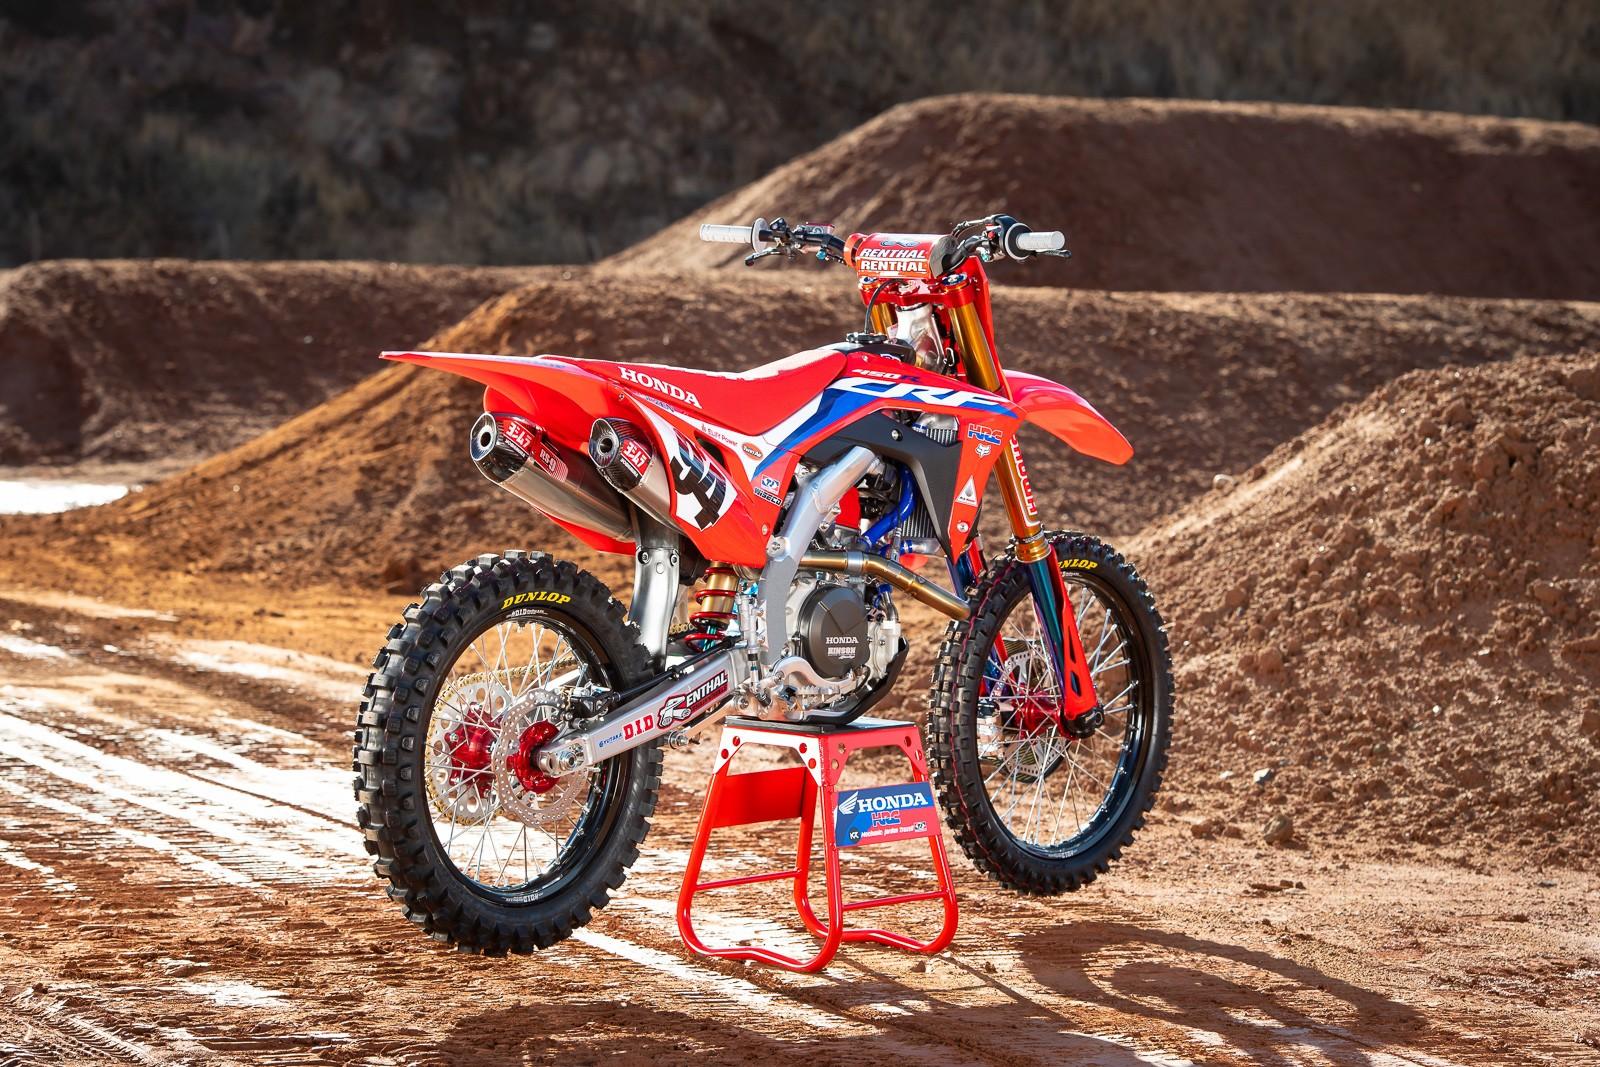 ken roczen - team honda hrc 2020 - motocross pictures